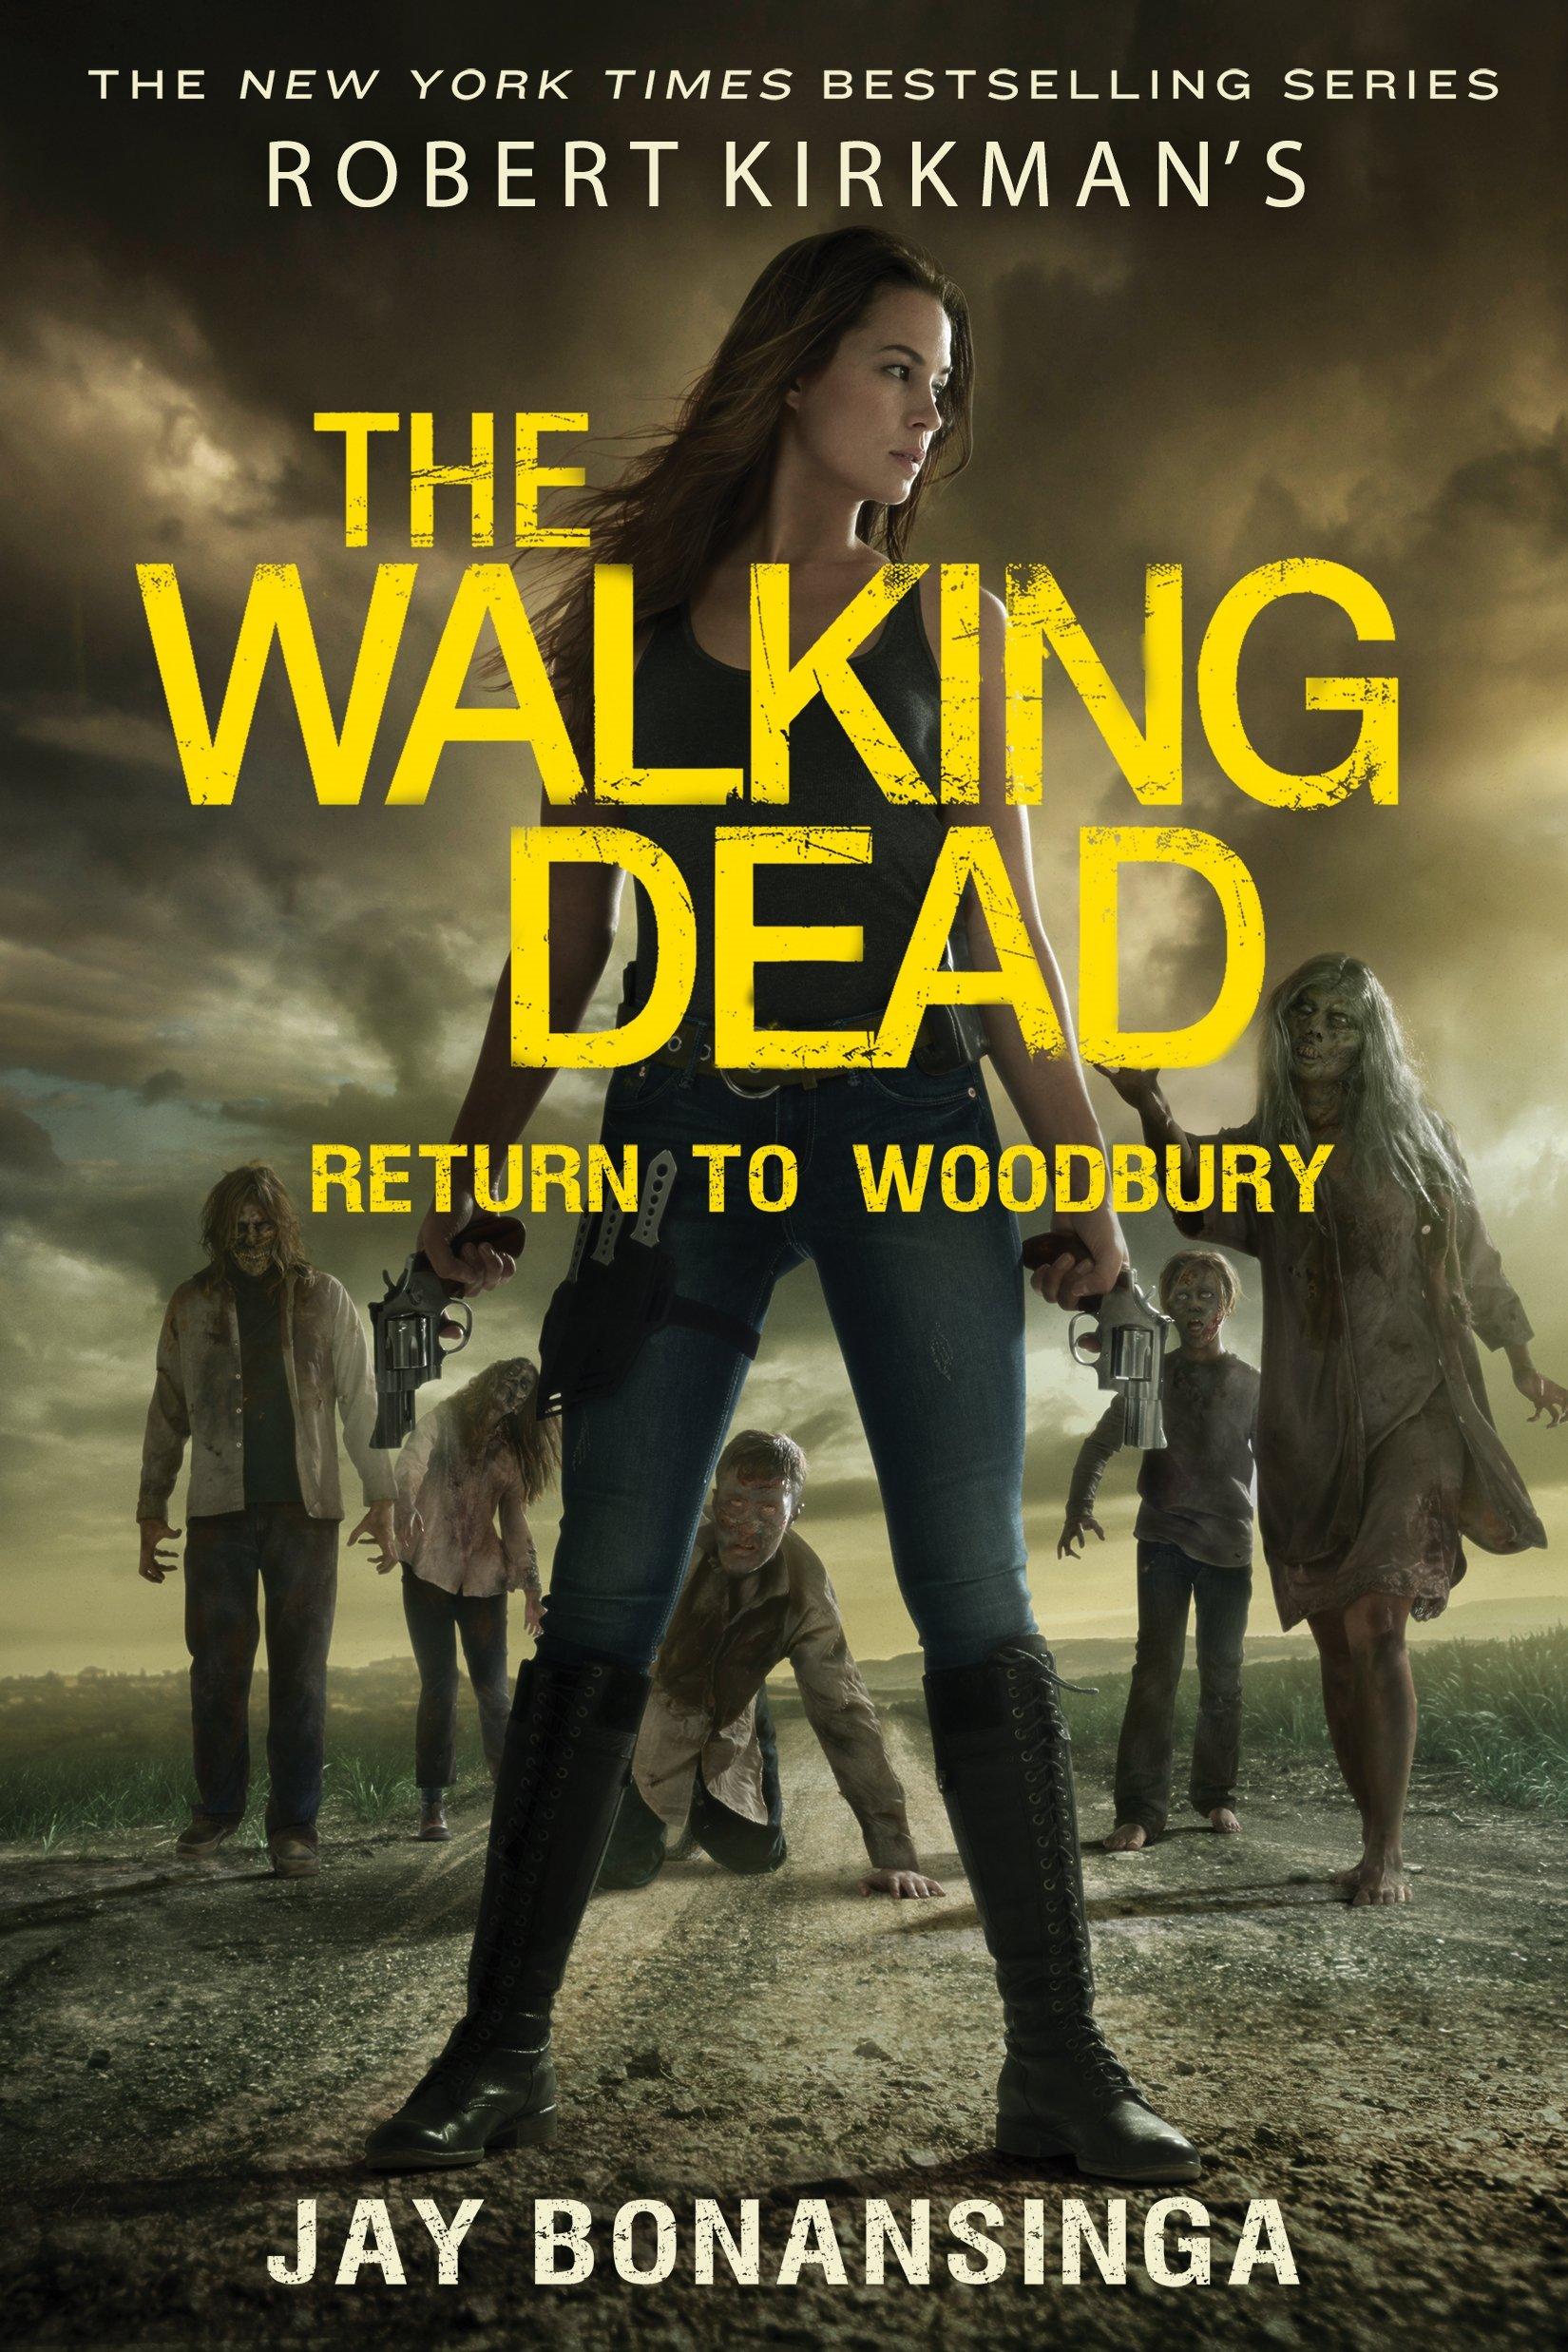 Download Robert Kirkman's The Walking Dead: Return to Woodbury (The Walking Dead Series) ebook